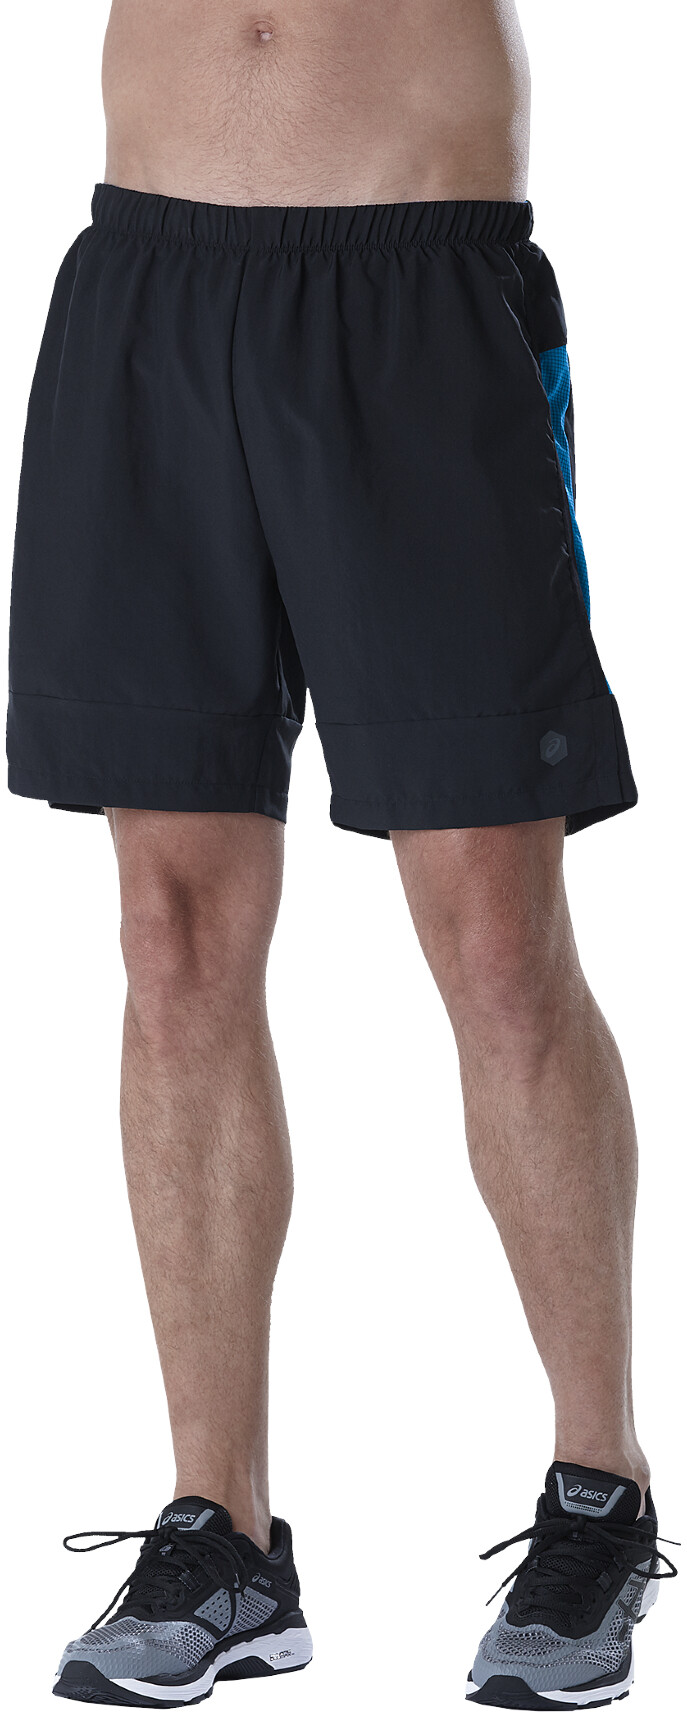 asics 7In Shorts Herrer, performance black/directoire blue   Trousers